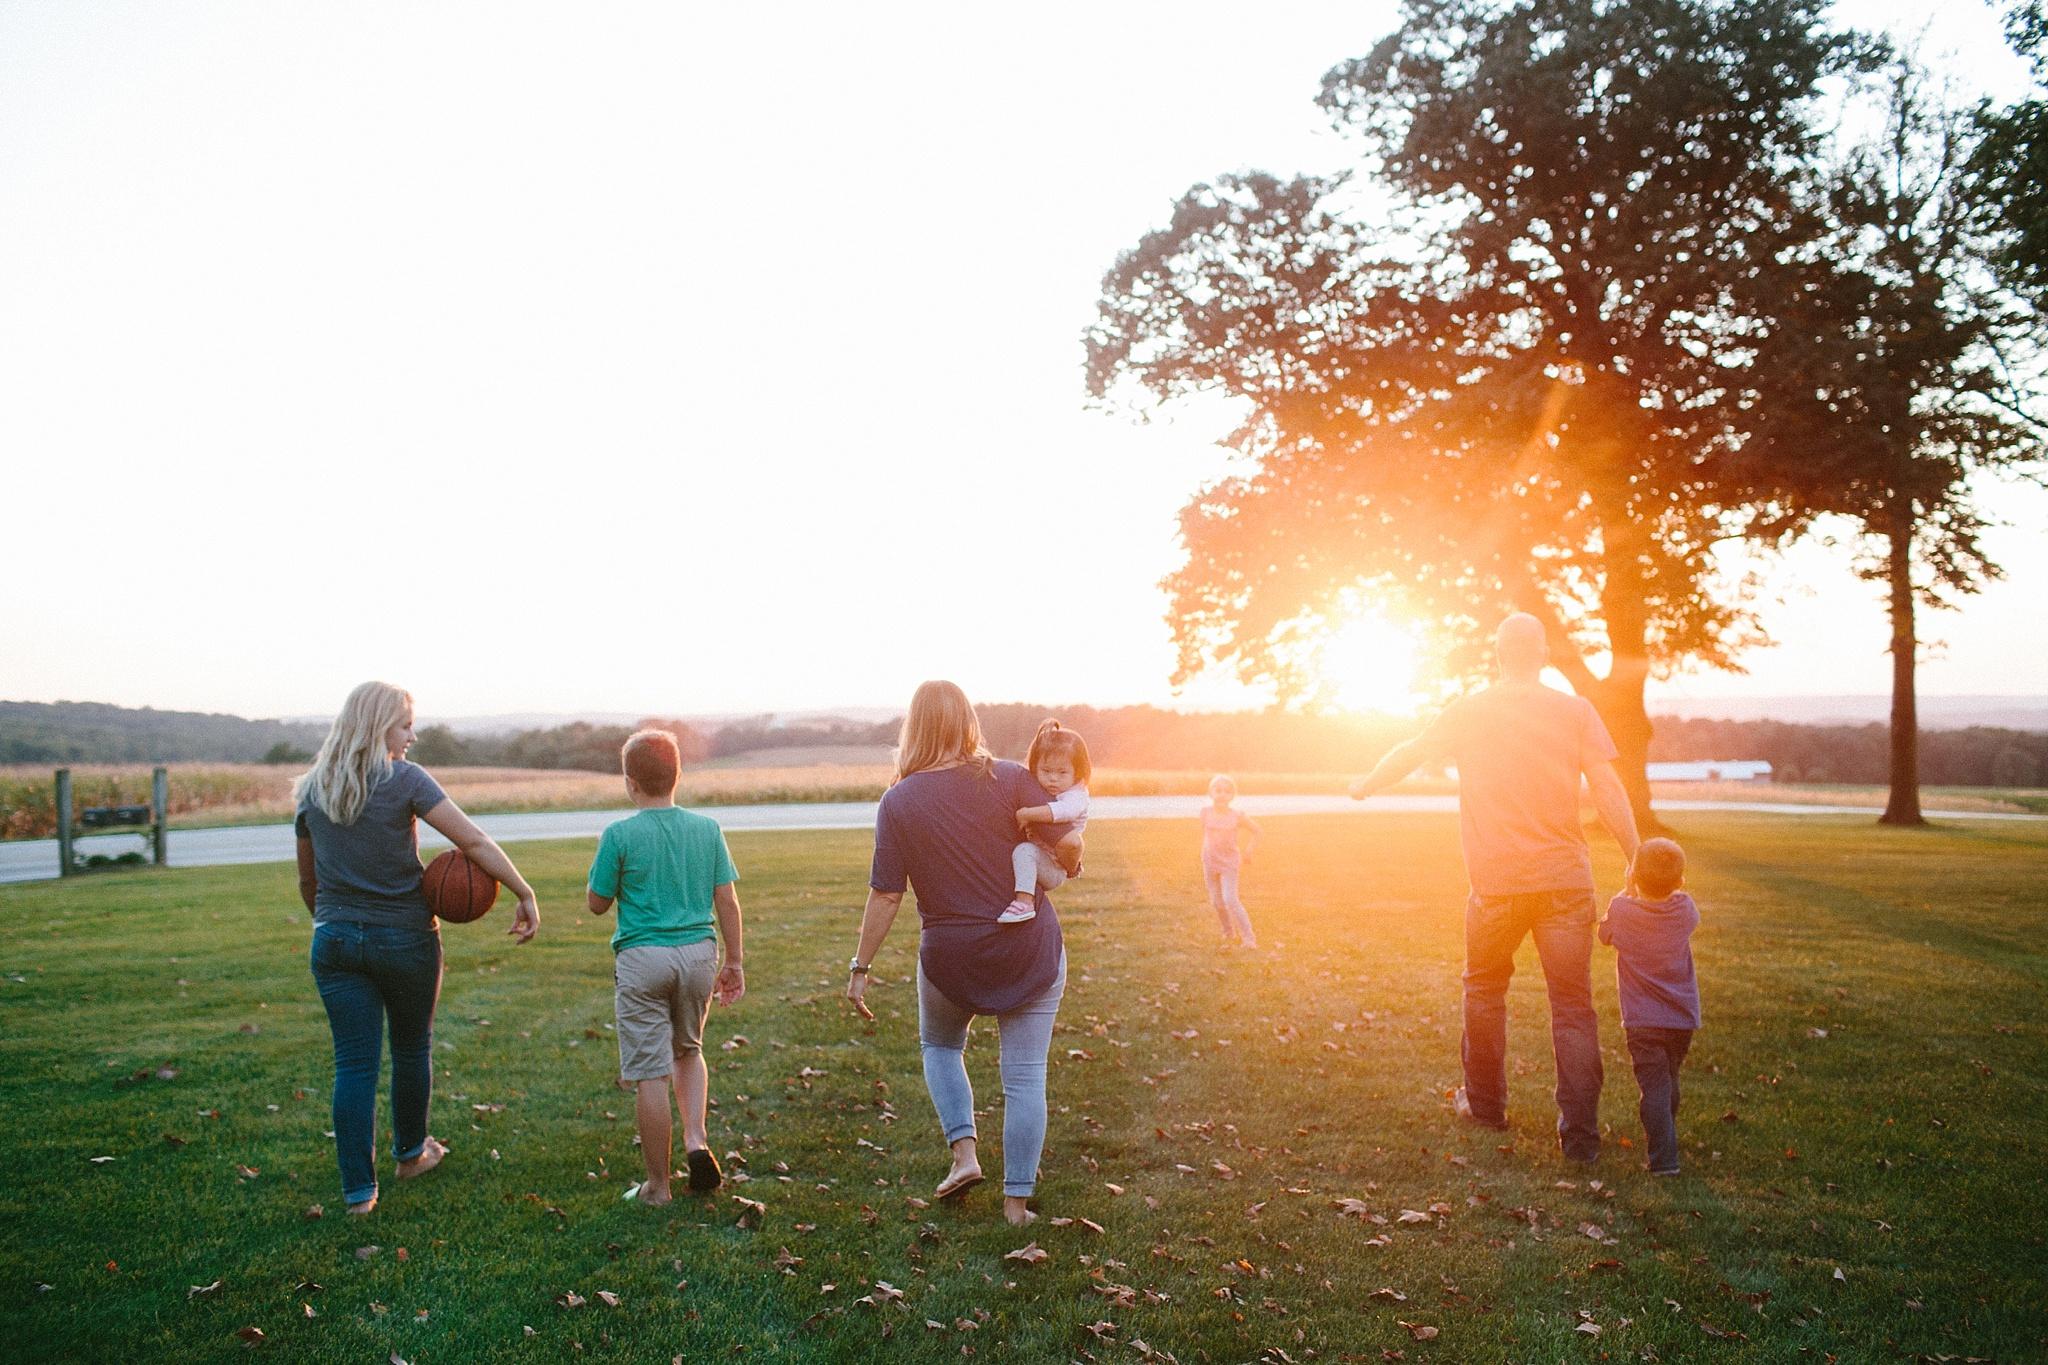 KellyLappPhotography_familyphotojournalism_inhomesession_Lancasterfamilyphotographer_Hostetter_32.JPG